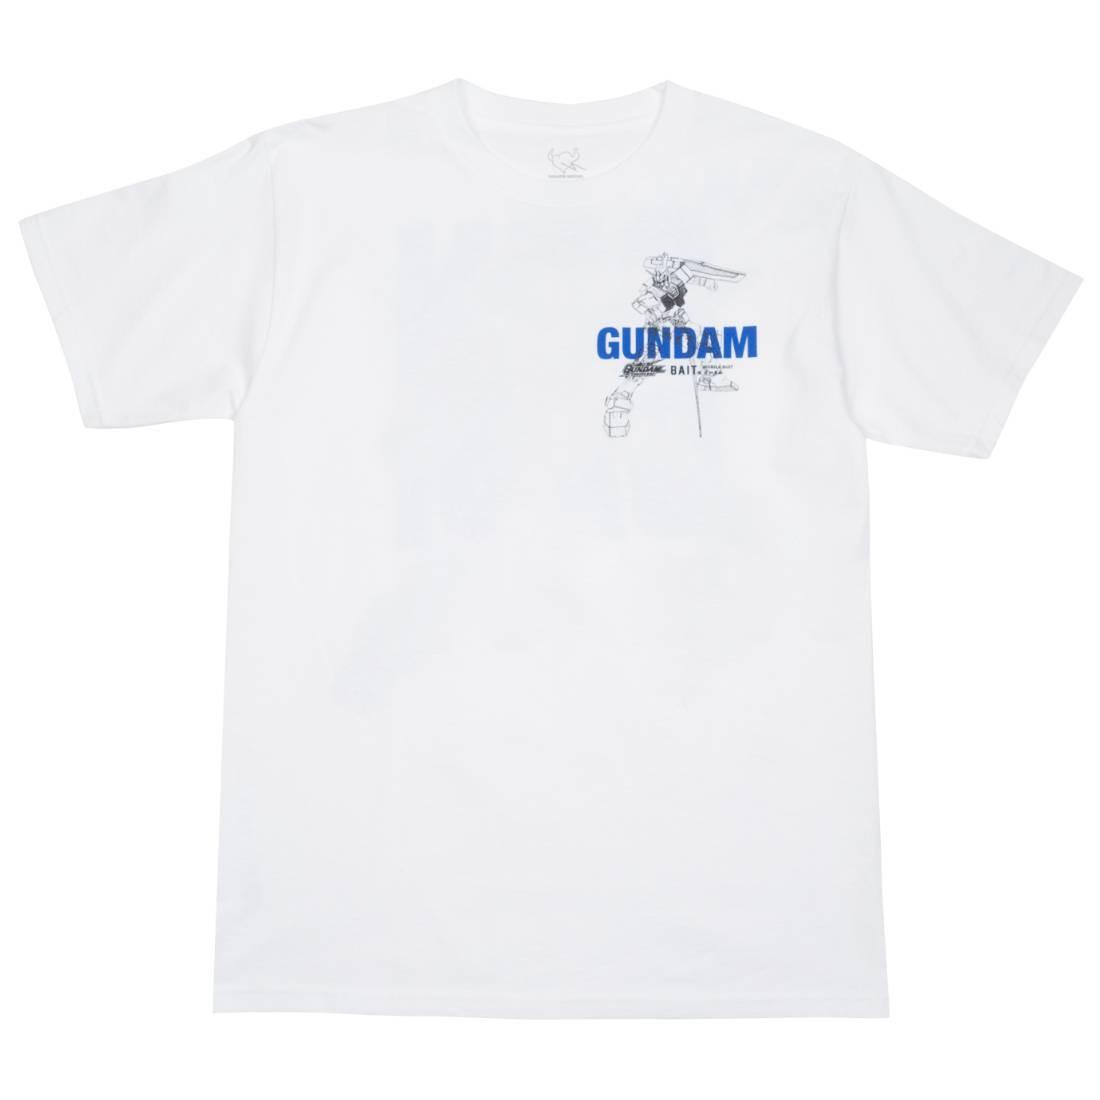 BAIT Gundam RX78 SS TEE - 204-GDM-TEE-001